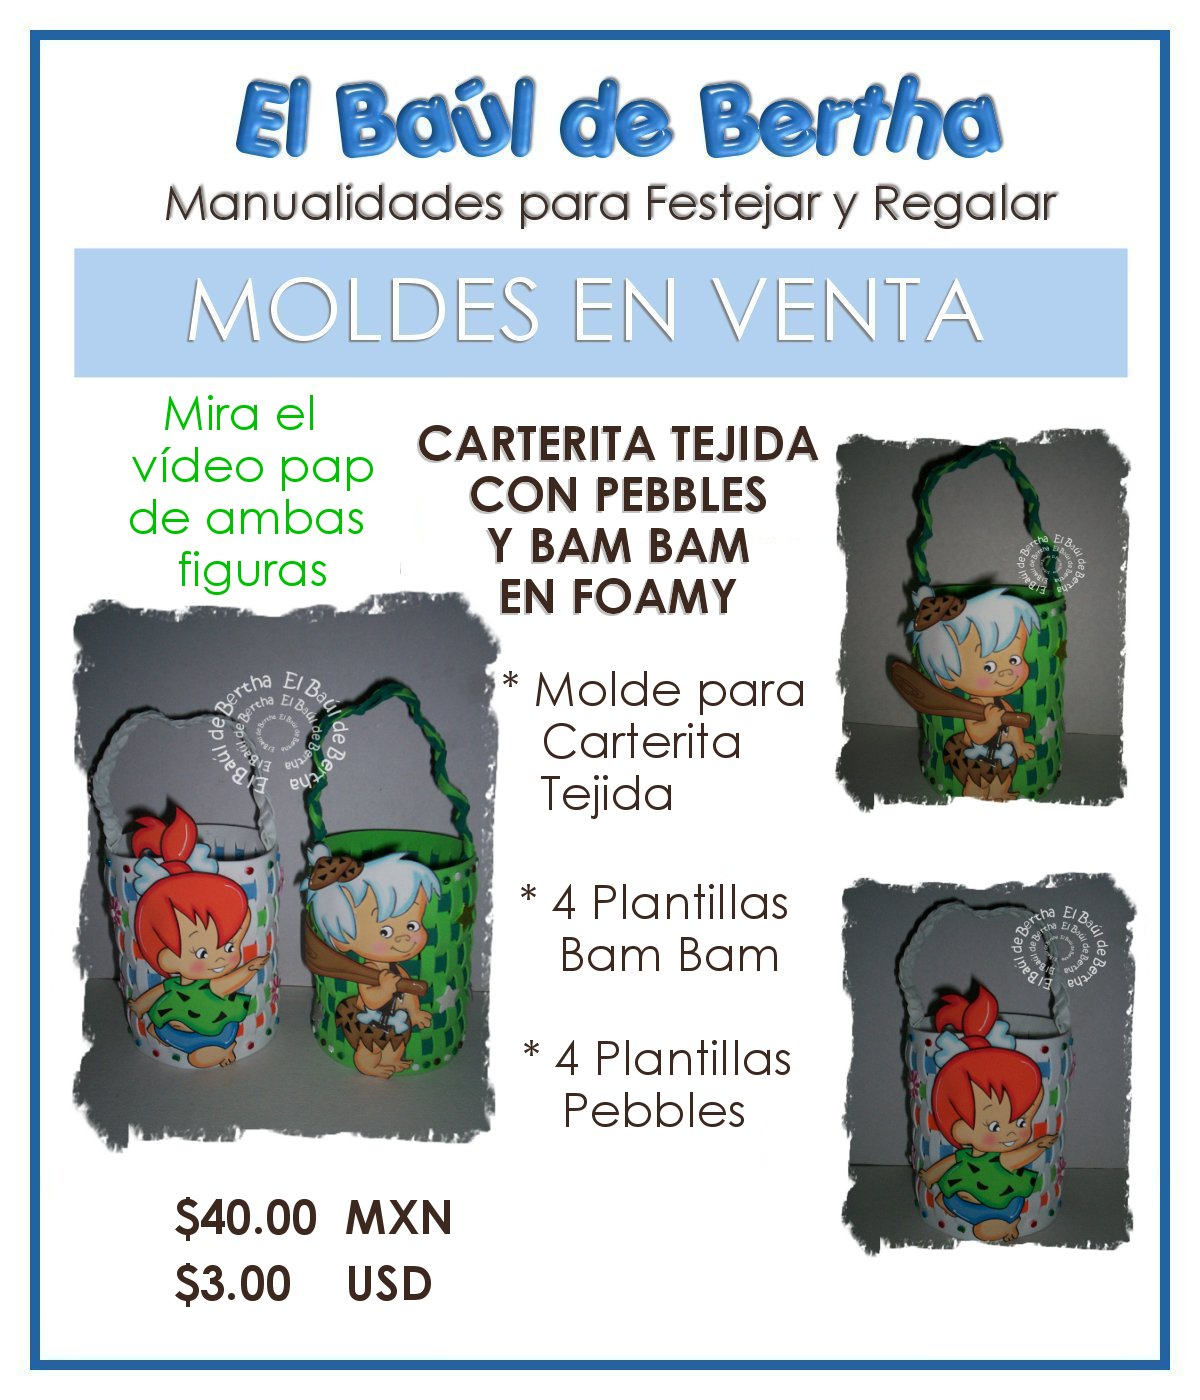 Carterita Tejida con Pebbles y Bam Bam BannerVentadeMoldeCarteritaTejida